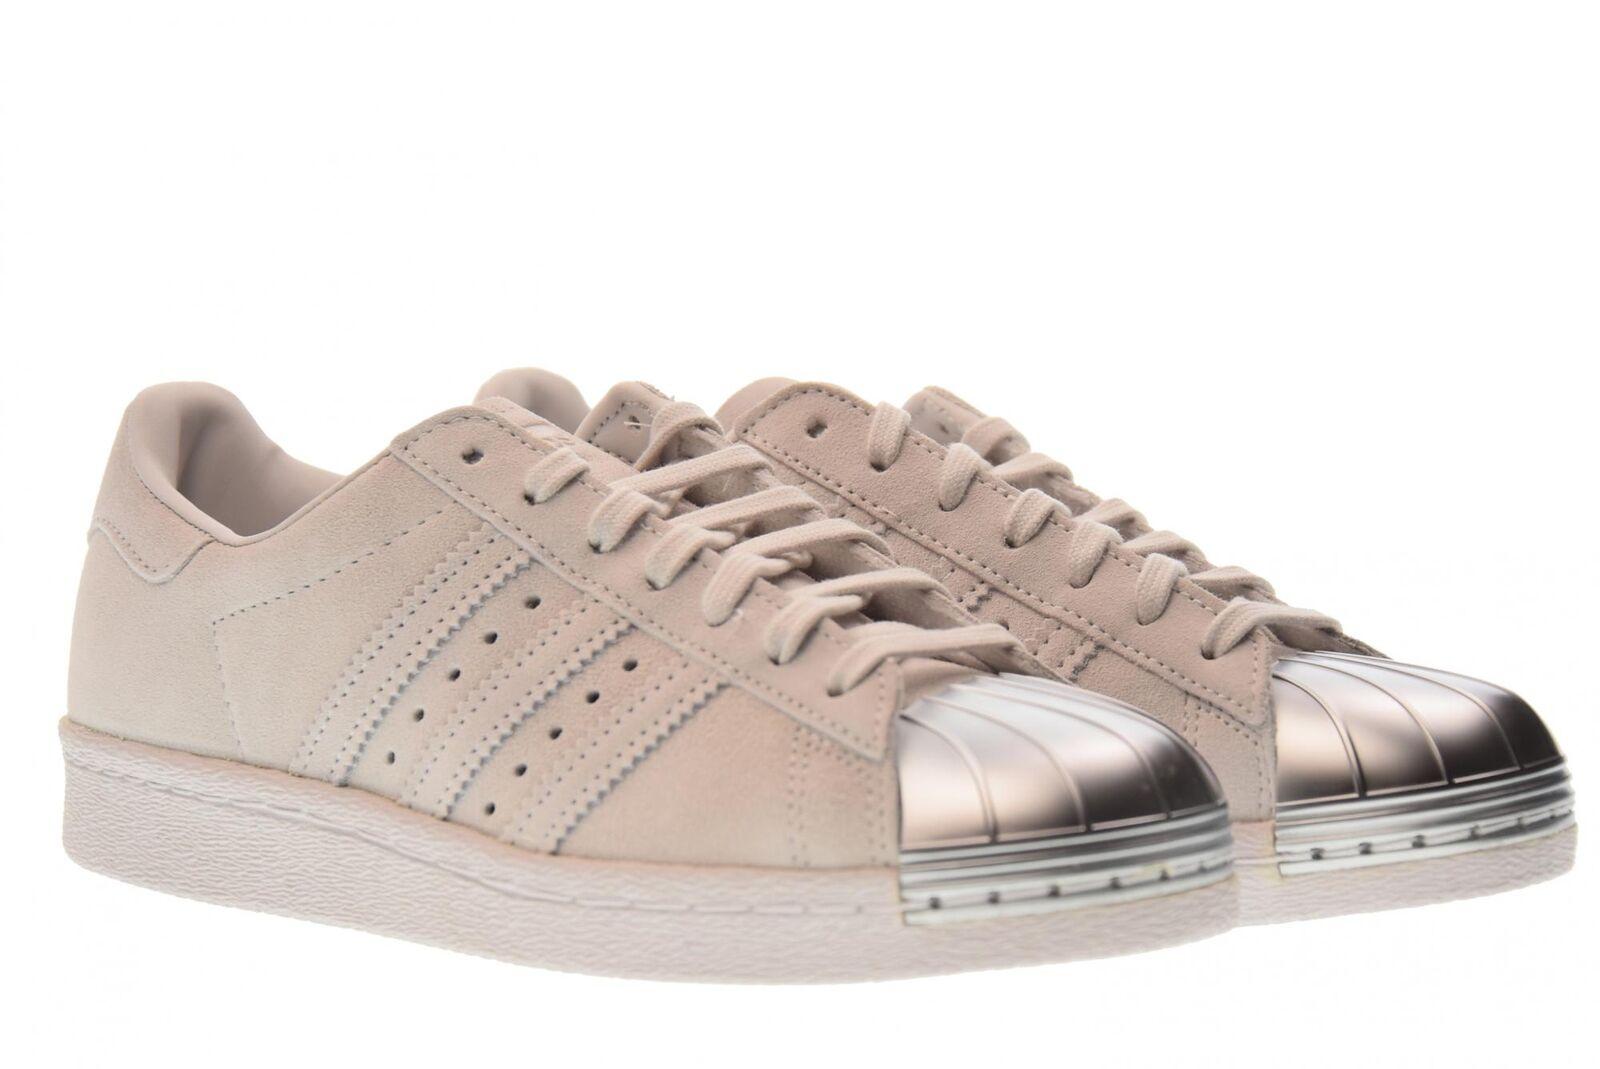 Silver Adidas Women Shoes Cp9945 Originals Grey Superstar 38 Metal W Toe Suede 80s HbWD9Ye2EI